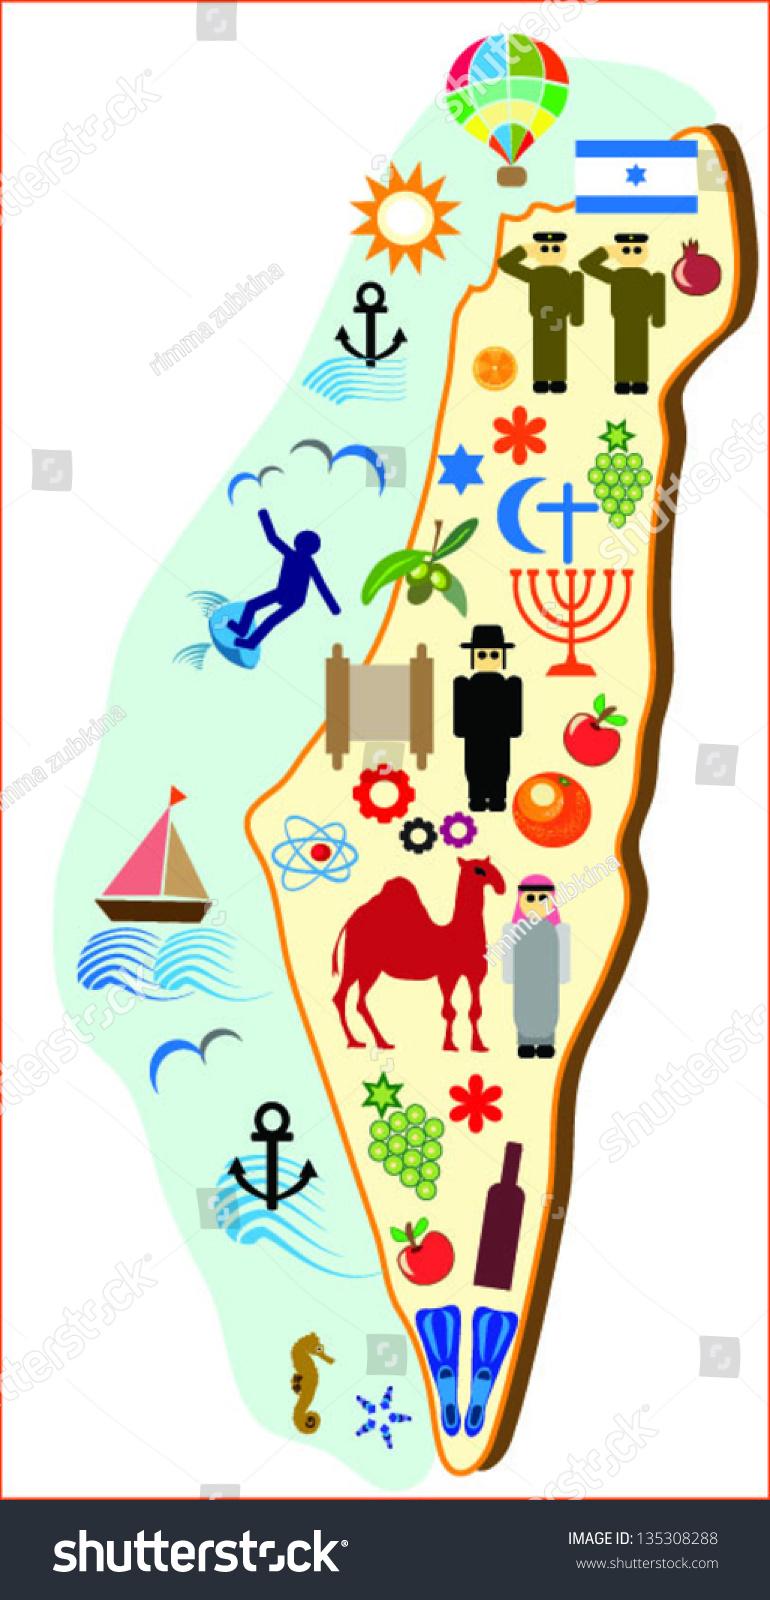 map of israel symbols of tourism. map israel symbols tourism stock vector   shutterstock